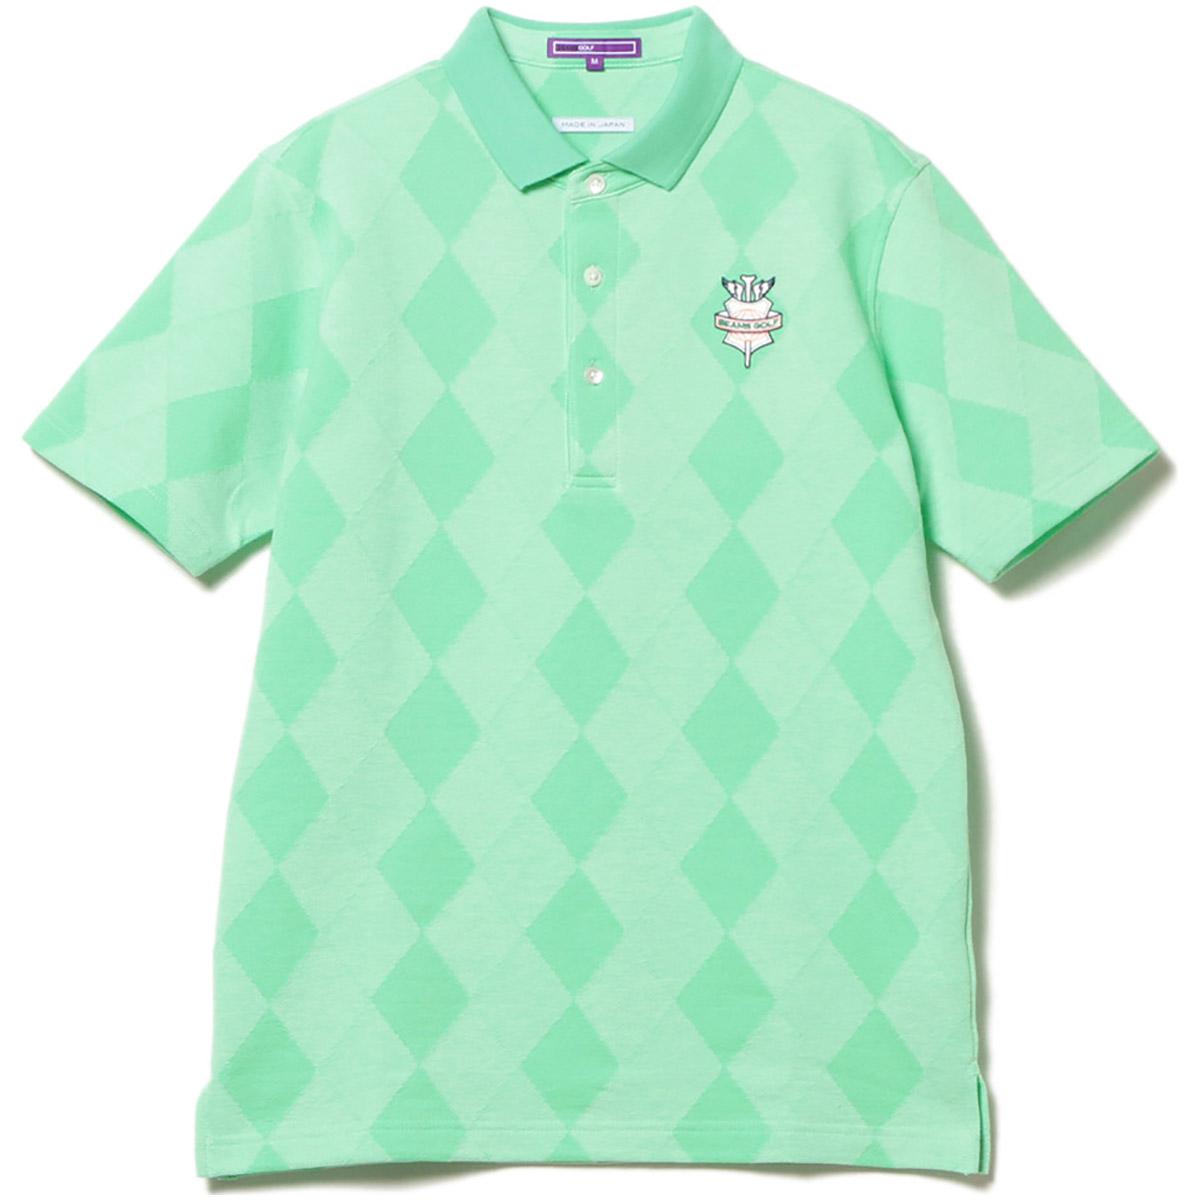 BEAMS GOLF PURPLE LABEL アーガイル ポロシャツ